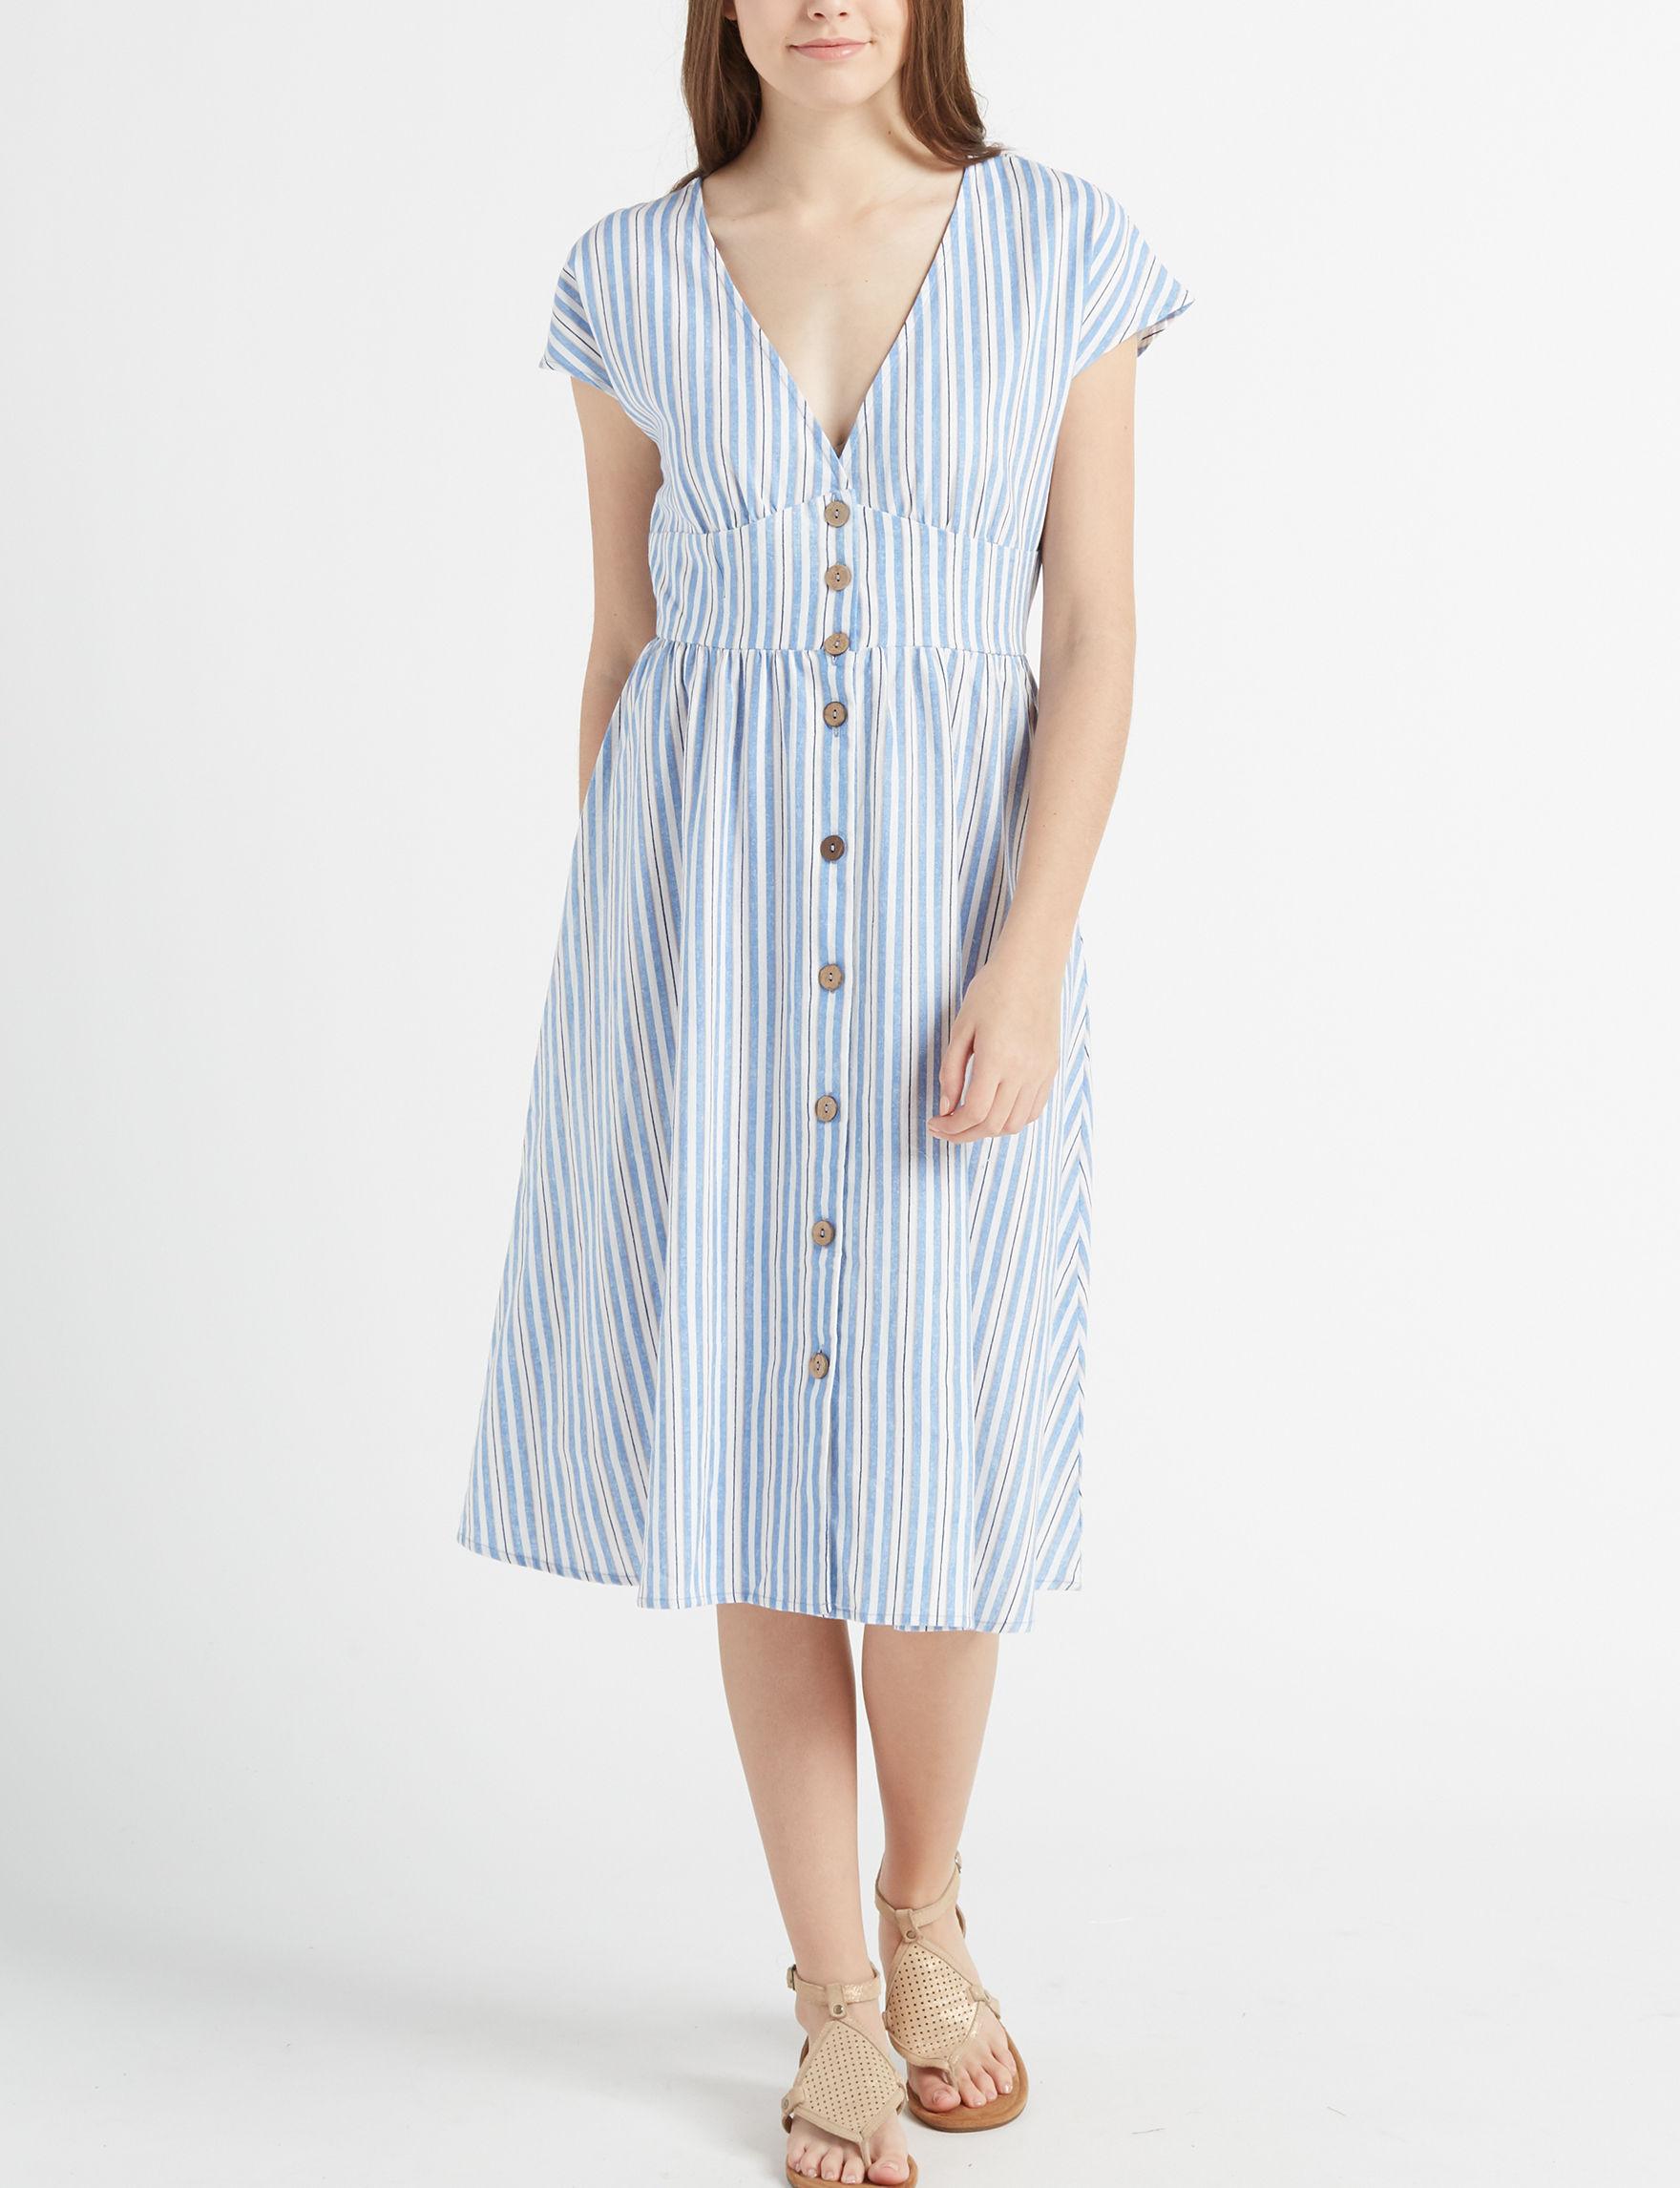 BeBop Beige Everyday & Casual Fit & Flare Dresses